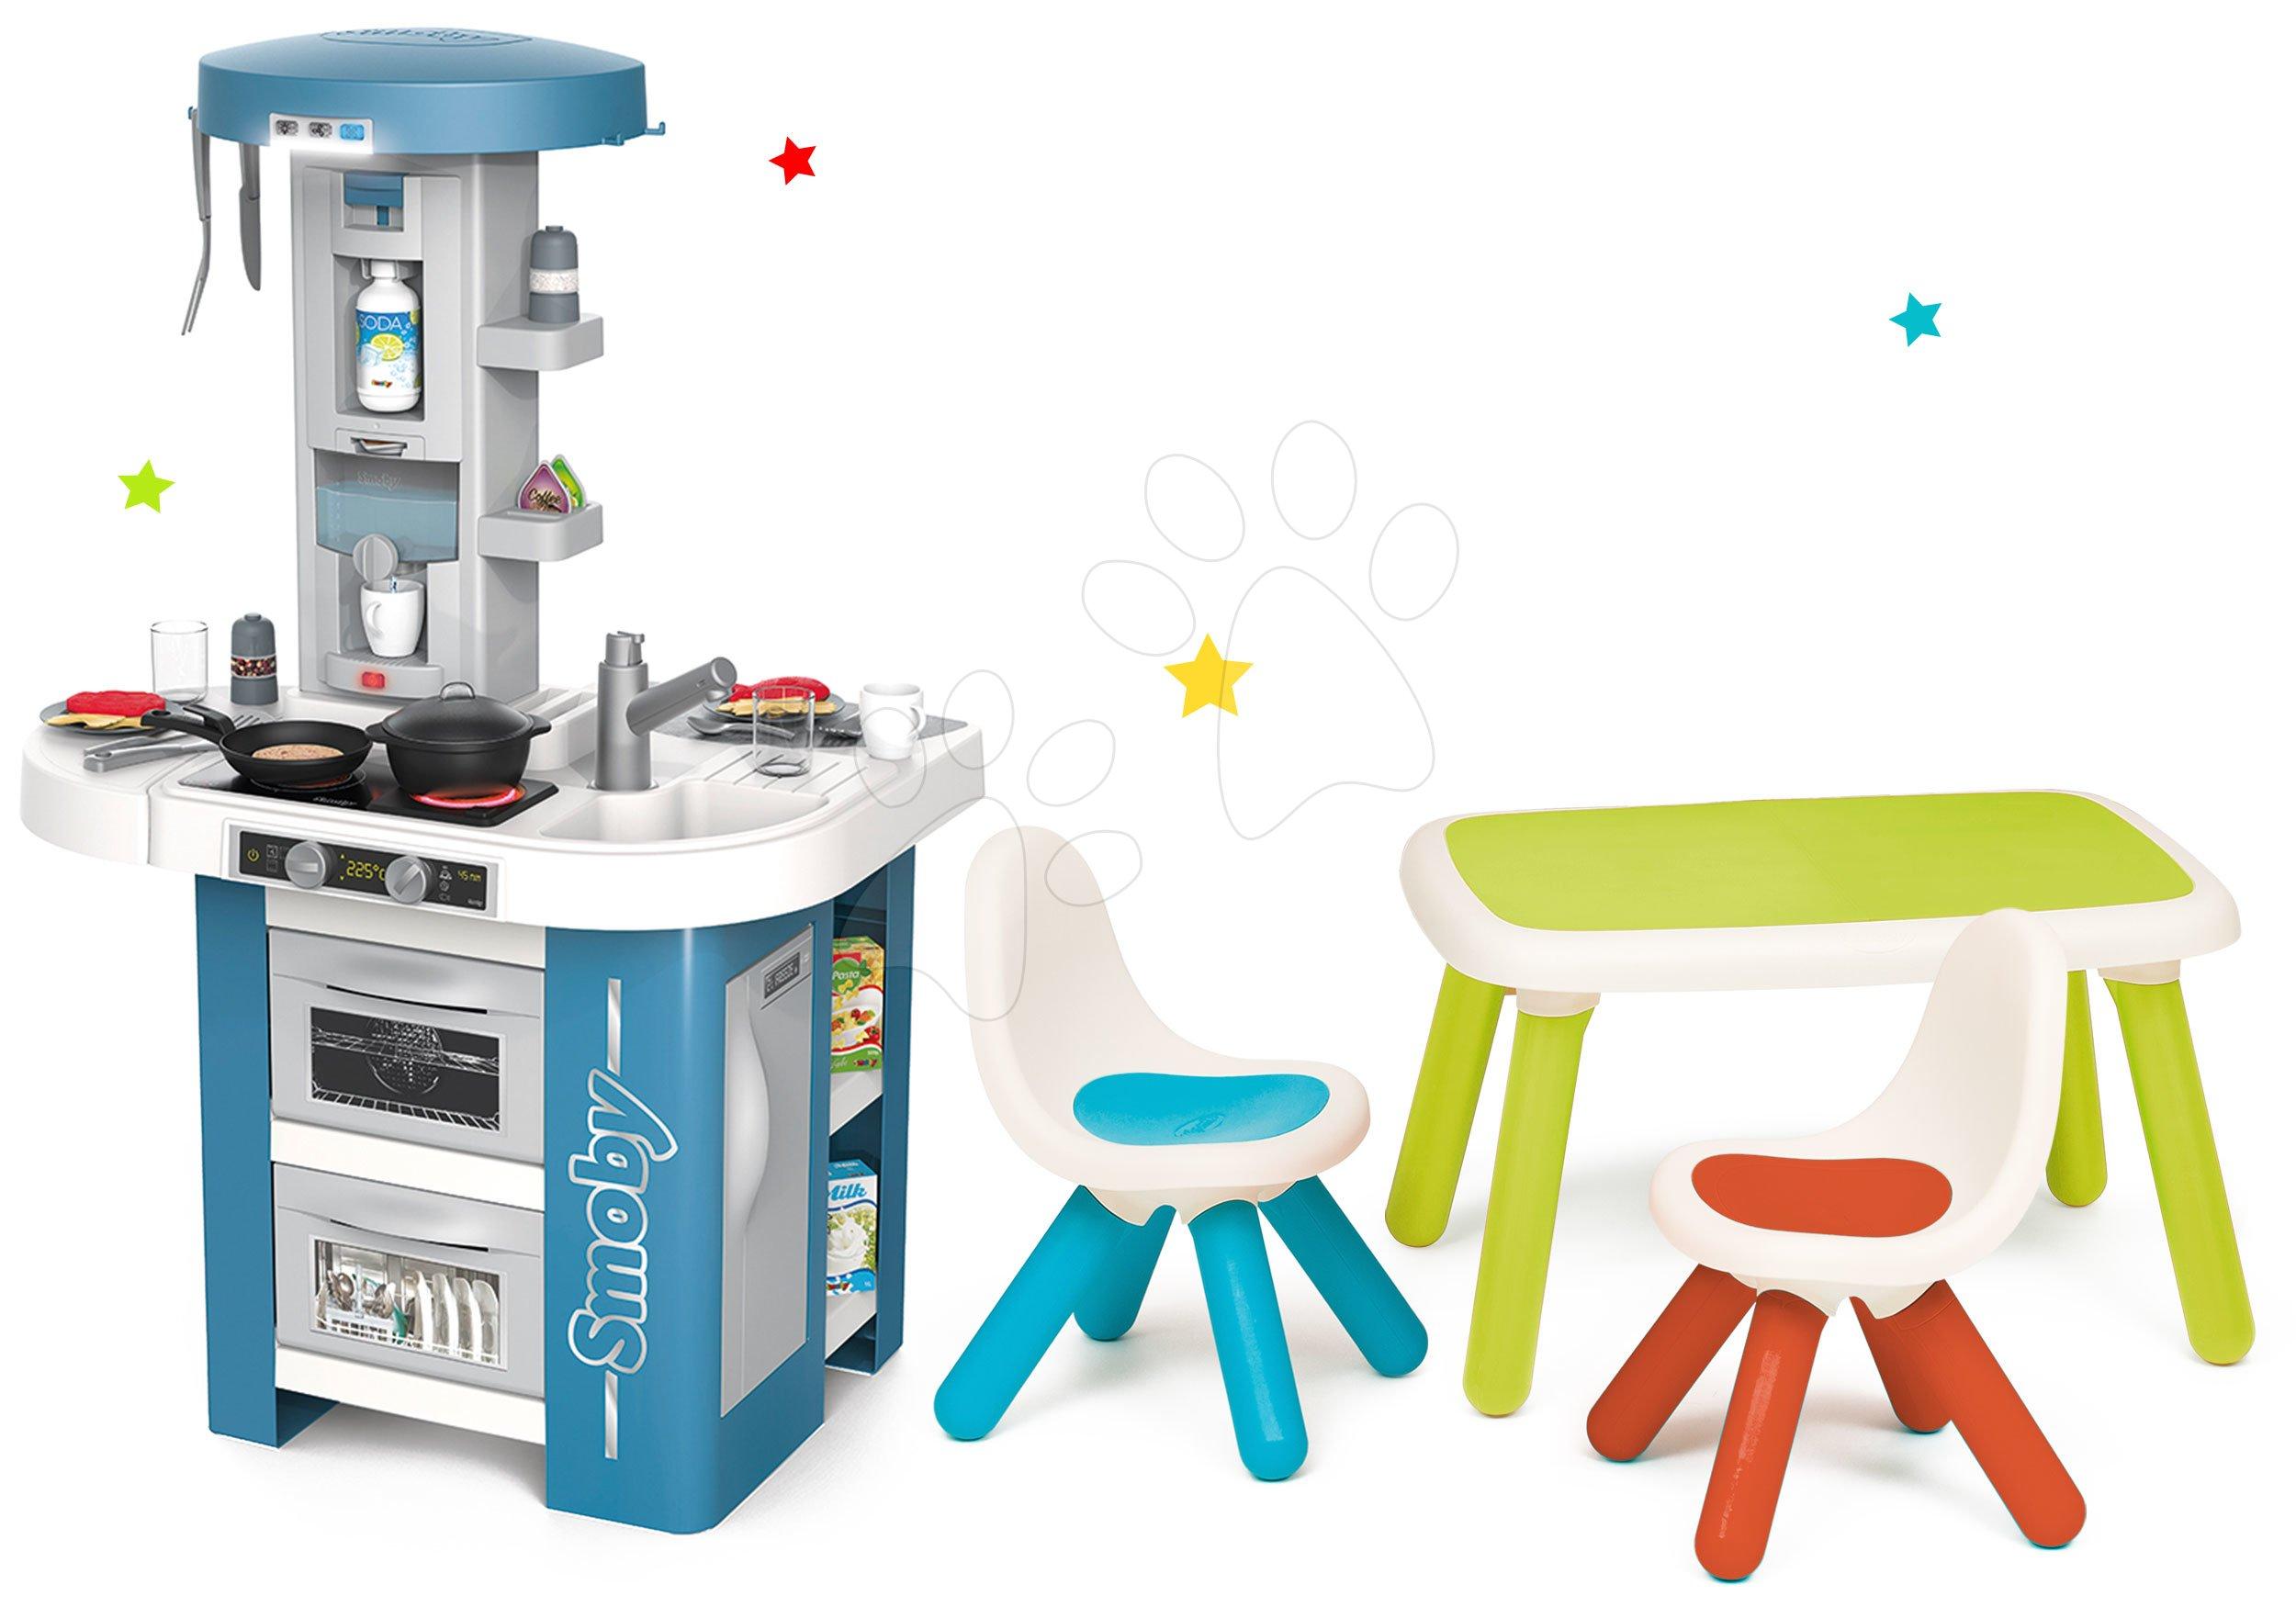 Kuchynky pre deti sety - Set kuchynka s technickým vybavením Tech Edition Smoby elektronická so stolom a dvoma stoličkami